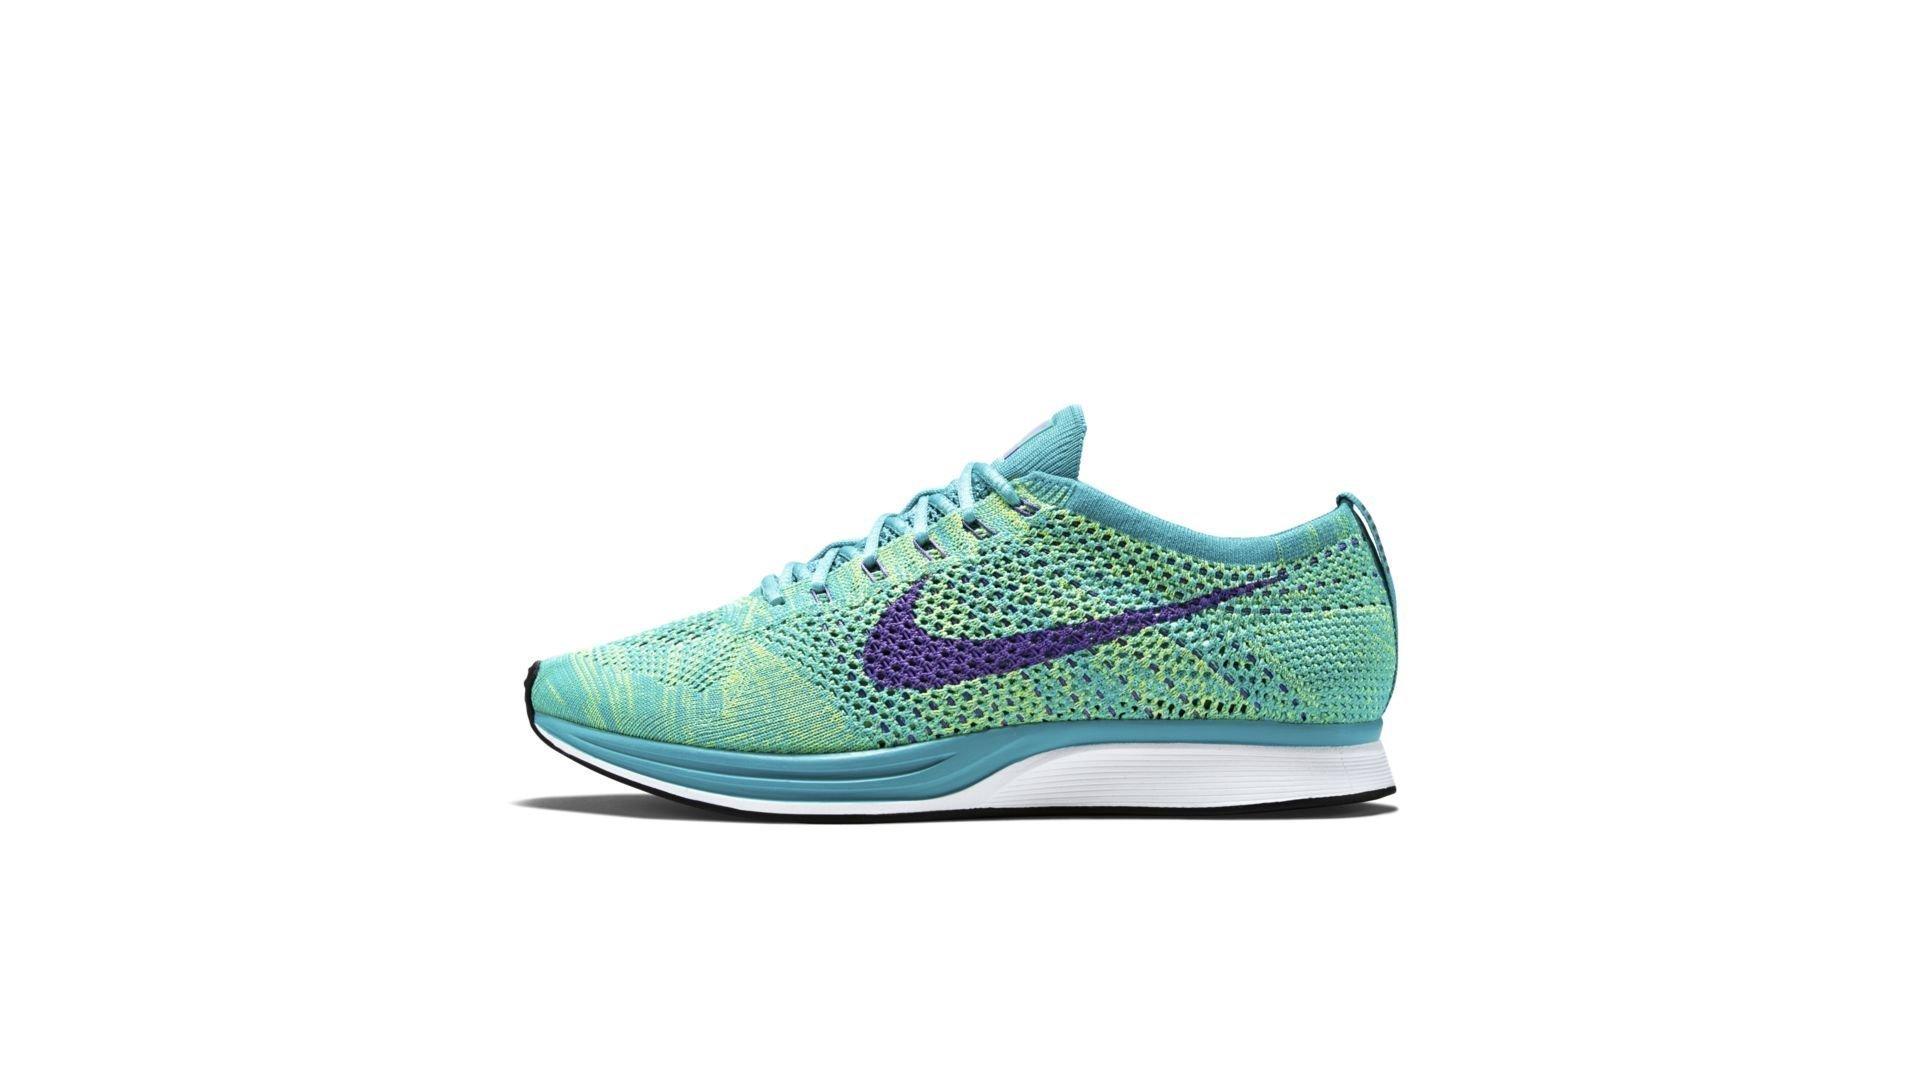 Nike Flyknit Racer Sport Turquoise Hyper Grape (526628-301)